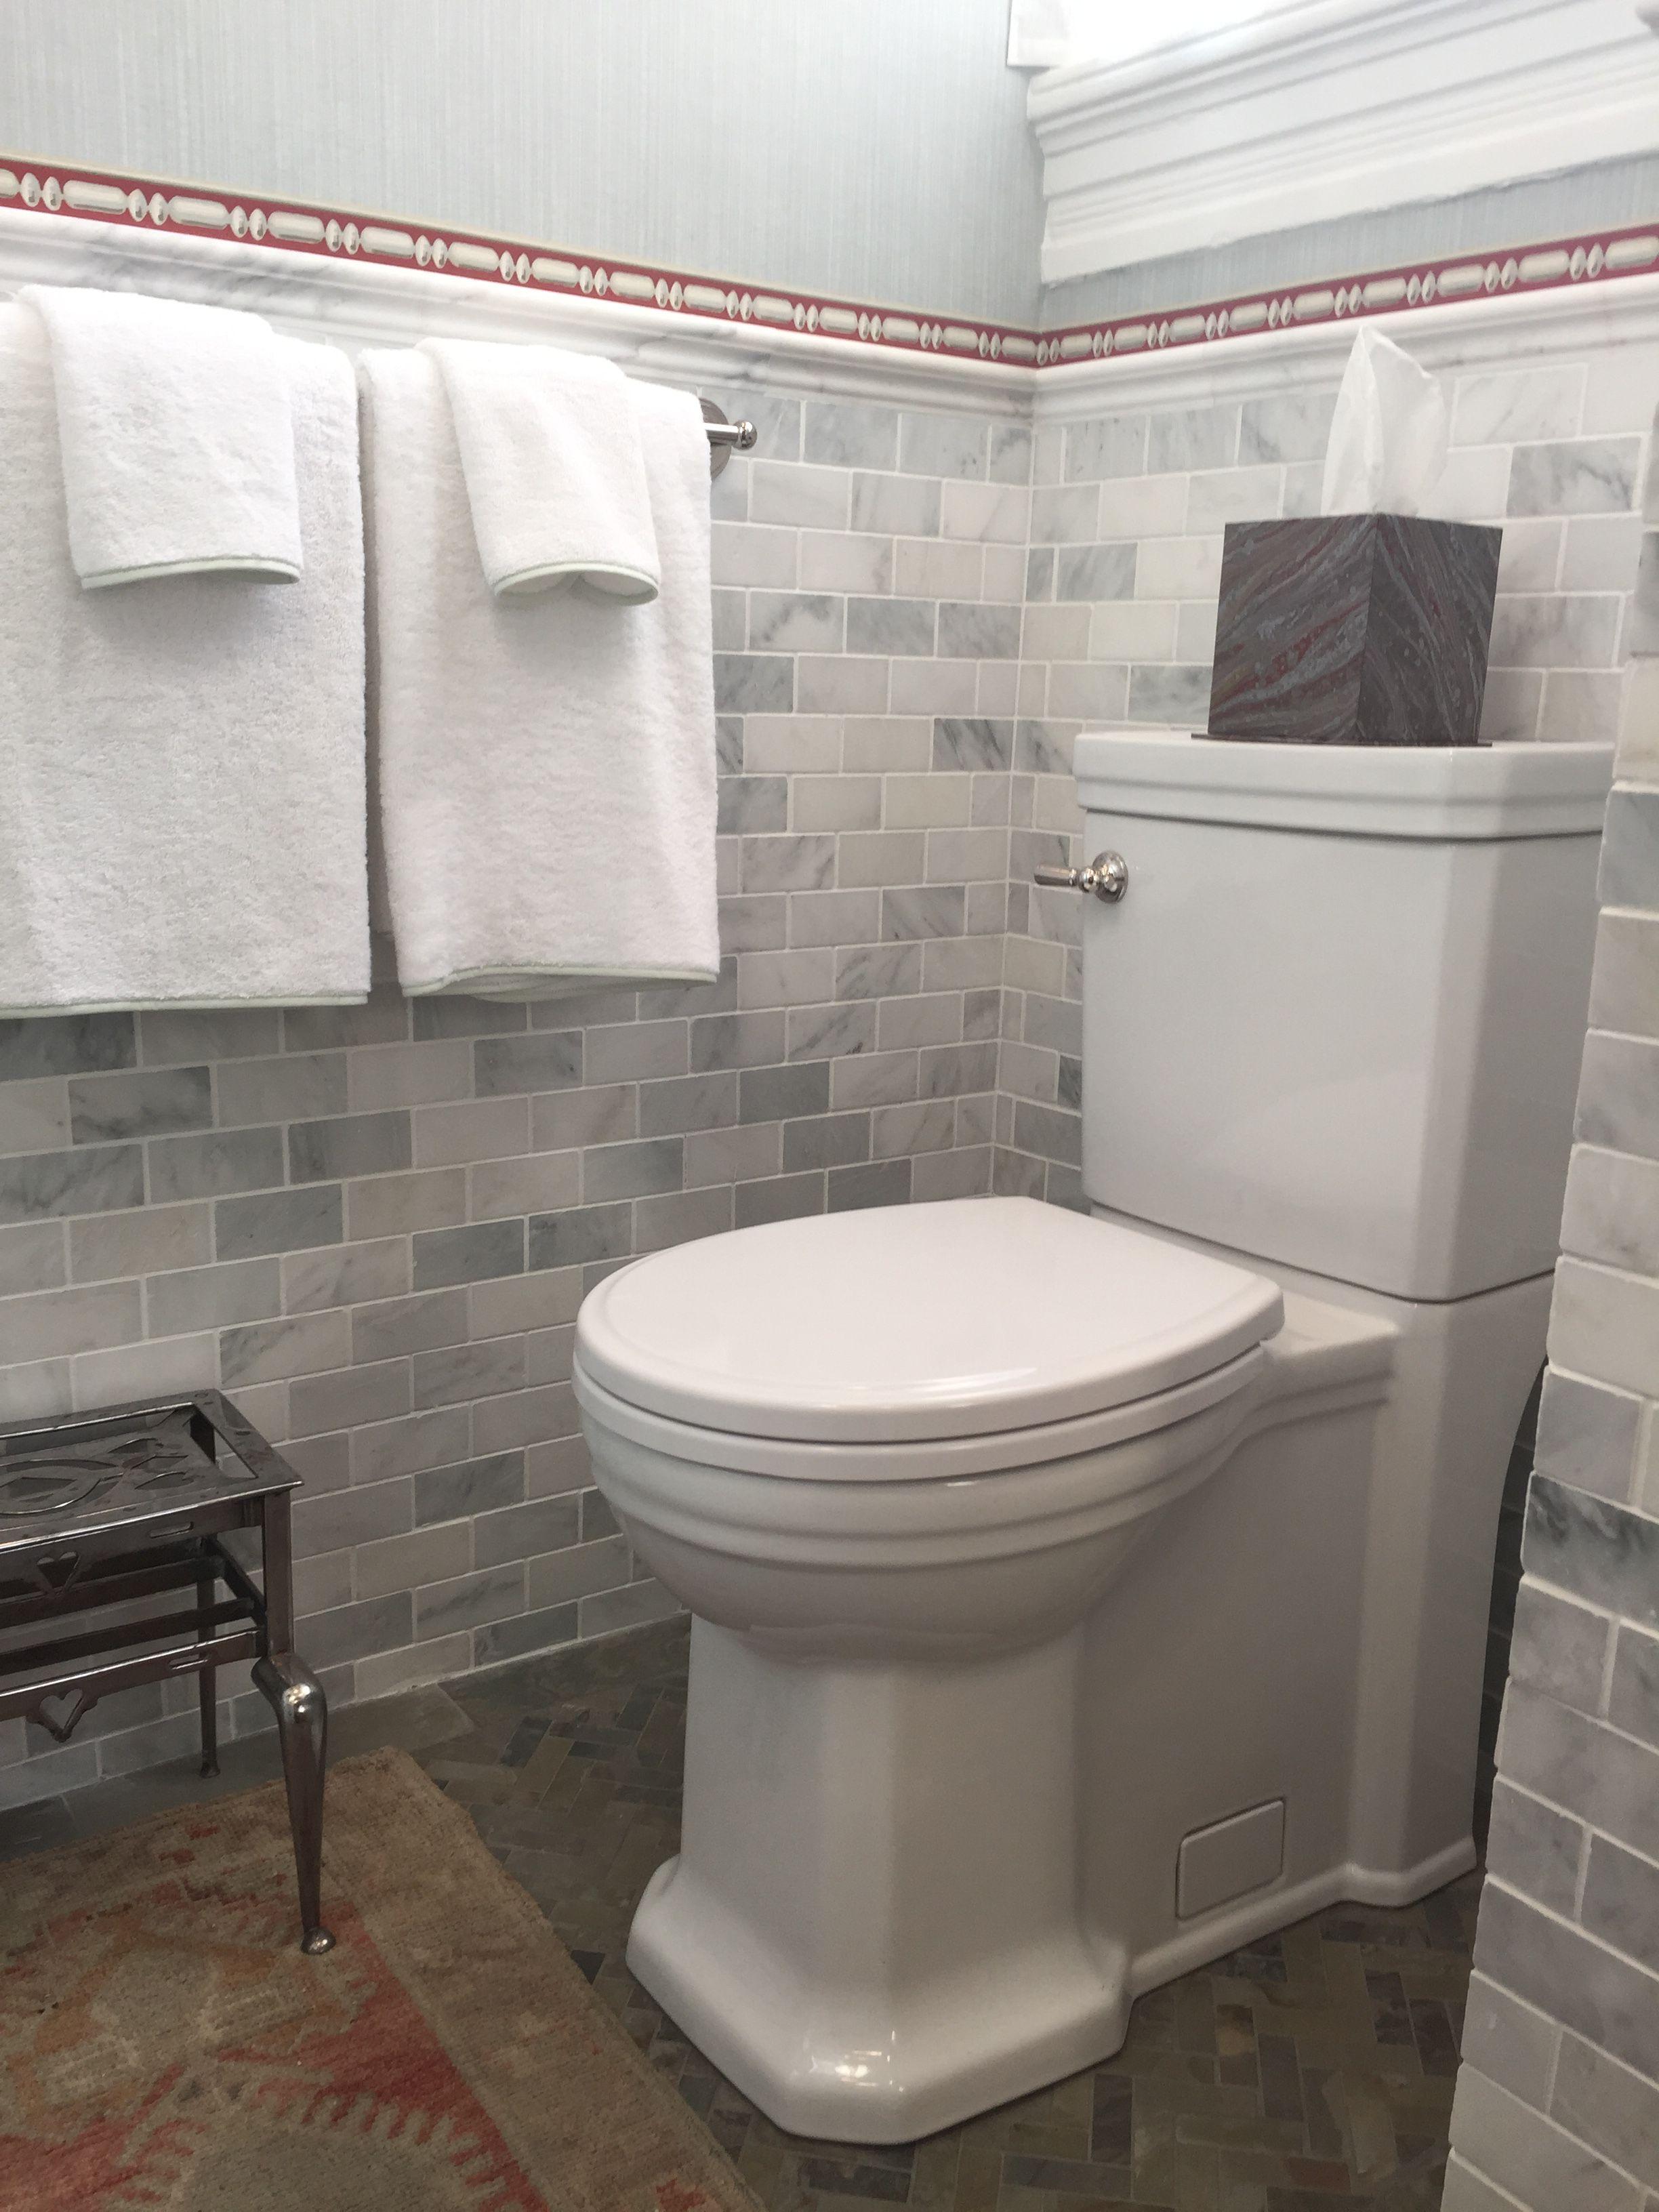 Second Floor Bathroom 2 By Olasky Sinsteden Featuring St George Two Piece Elongated Toilet Tile Floor Toilet Flooring